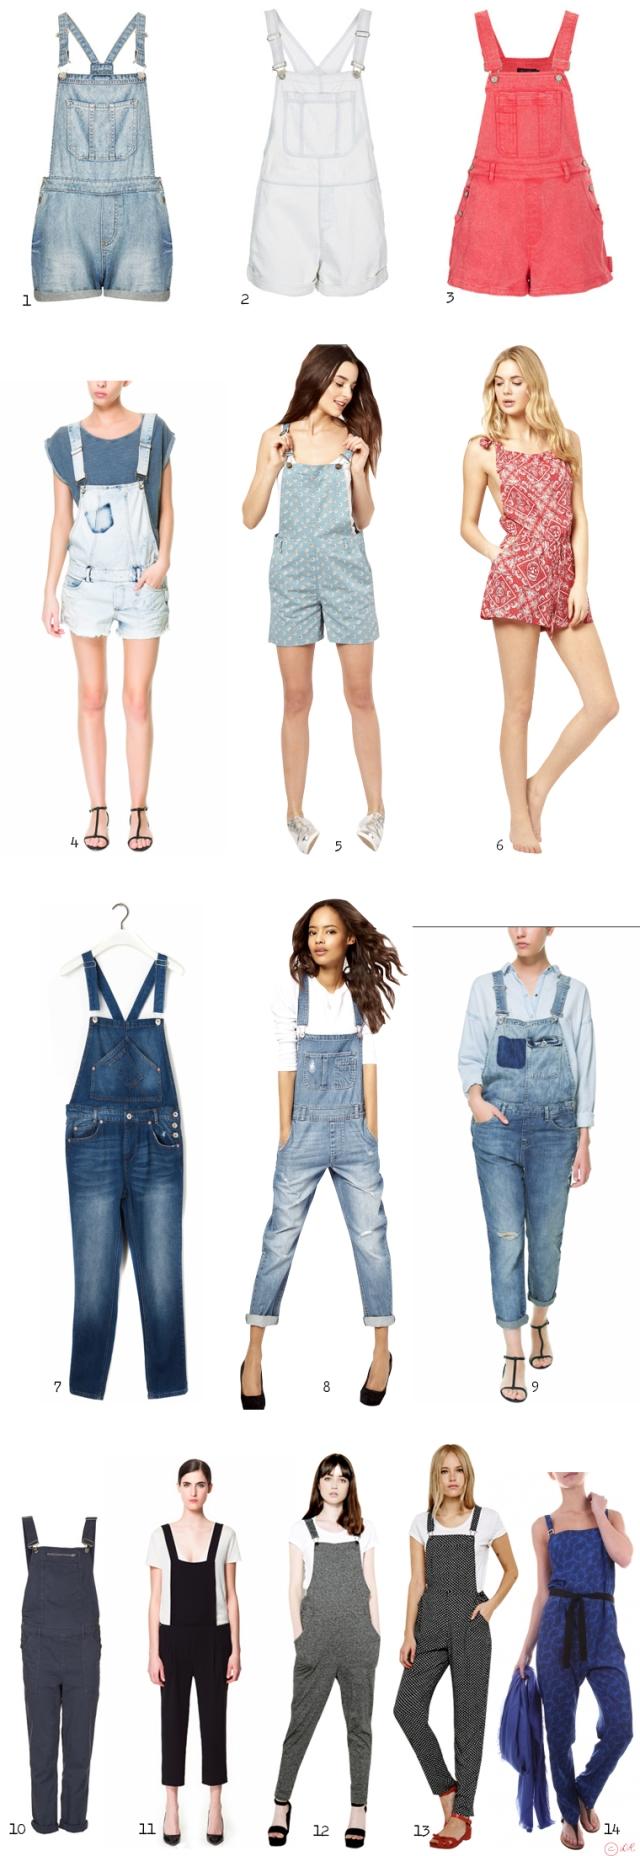 apprivoisement-fashion-inspiration-tumblr-salopette-2